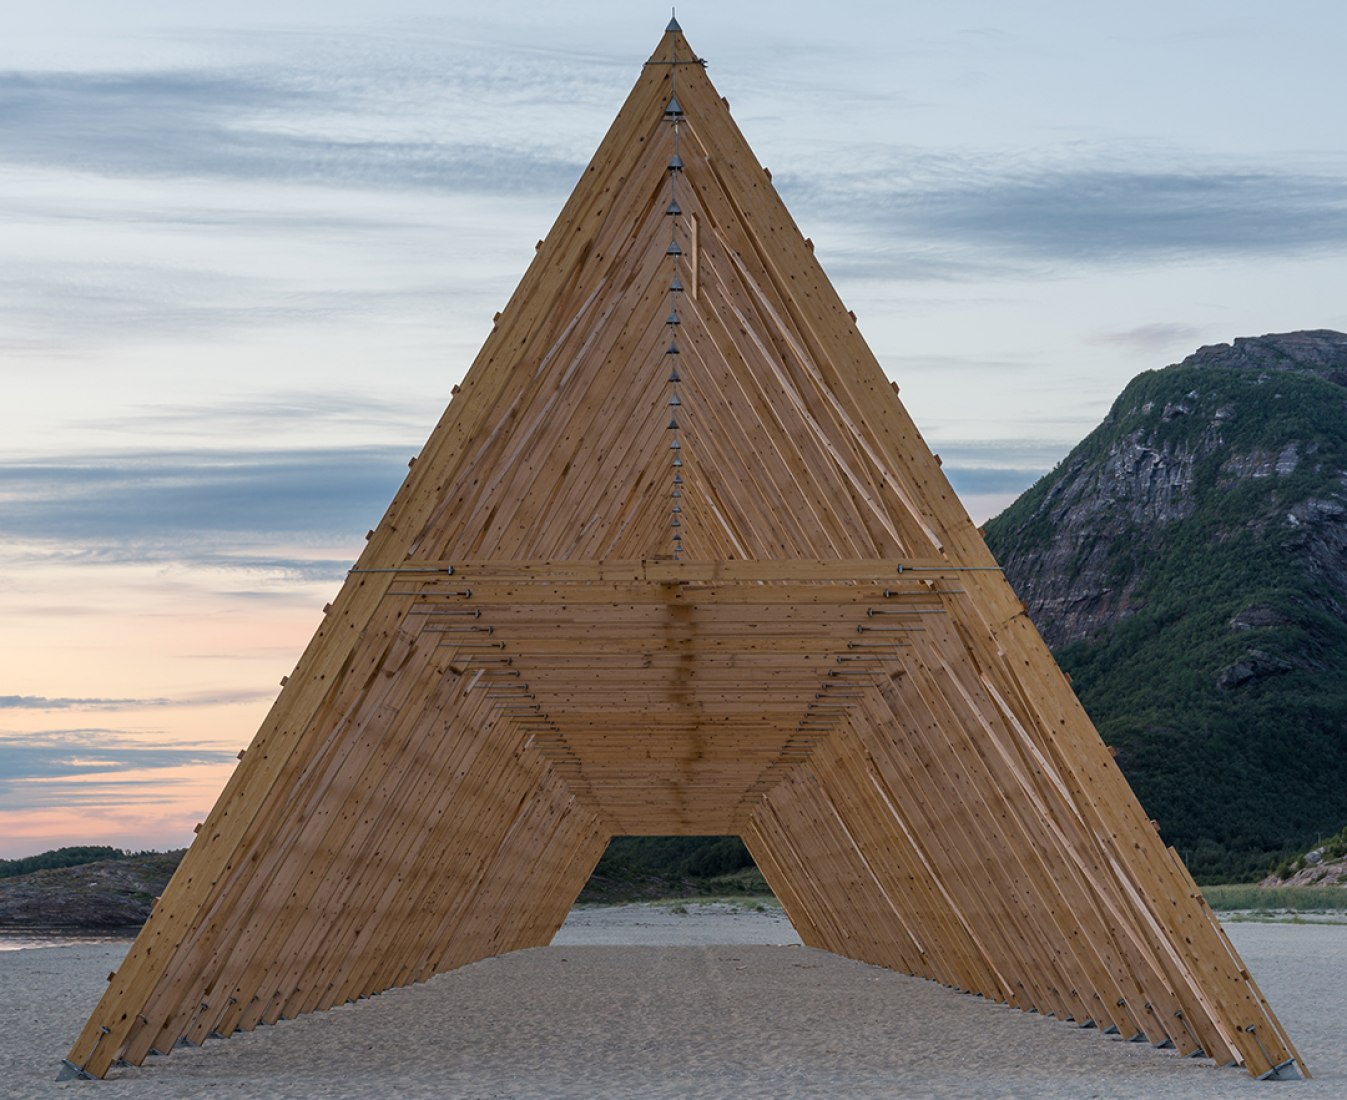 Main structure by Sami Rintala. Photography © Rintala Eggertsson Architects.